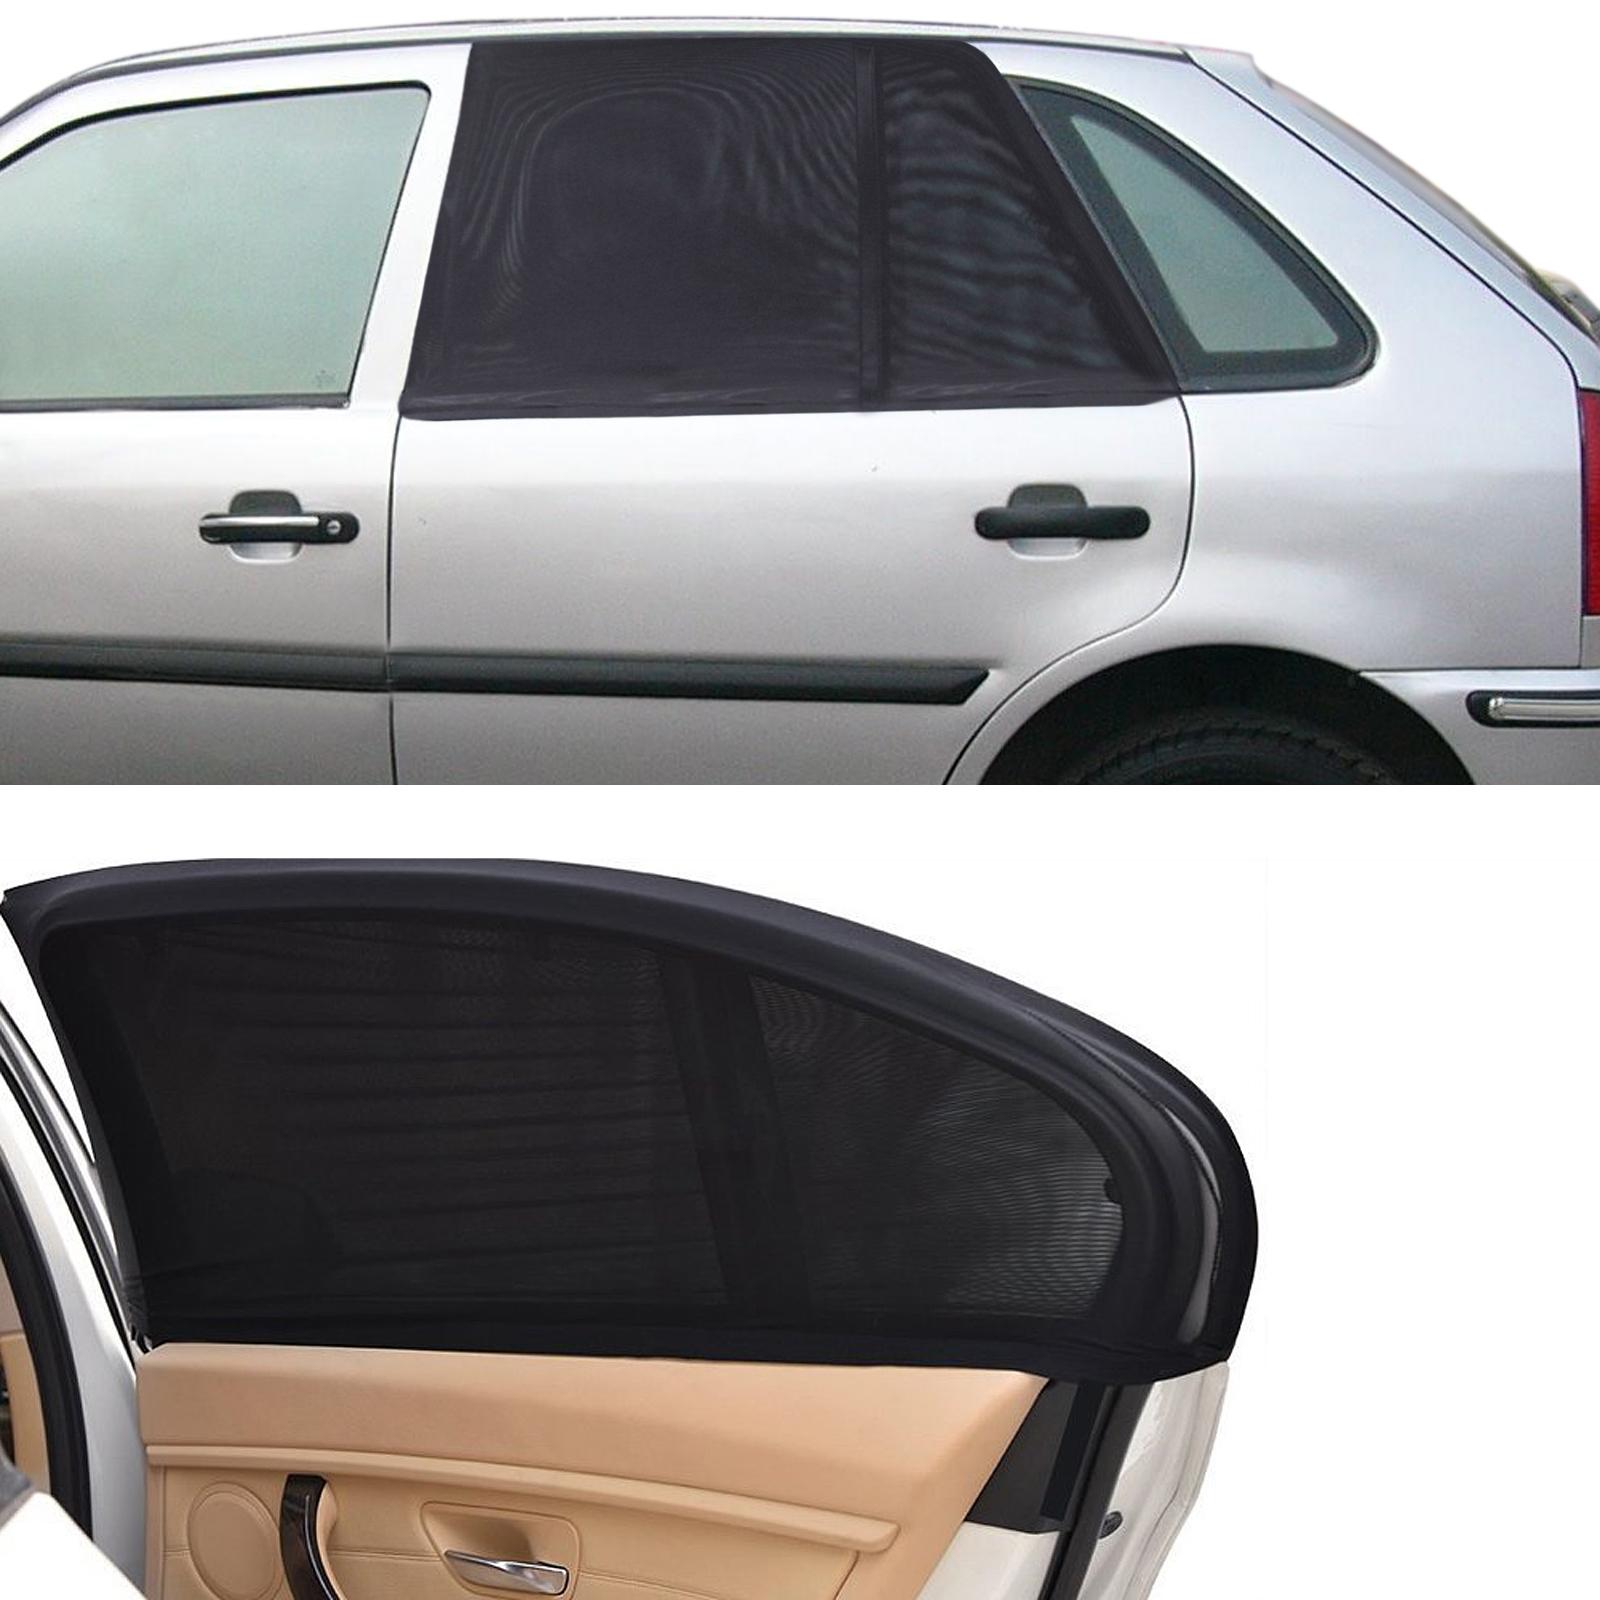 2x auto pkw universal sonnenblende suv seitenfenster baby. Black Bedroom Furniture Sets. Home Design Ideas